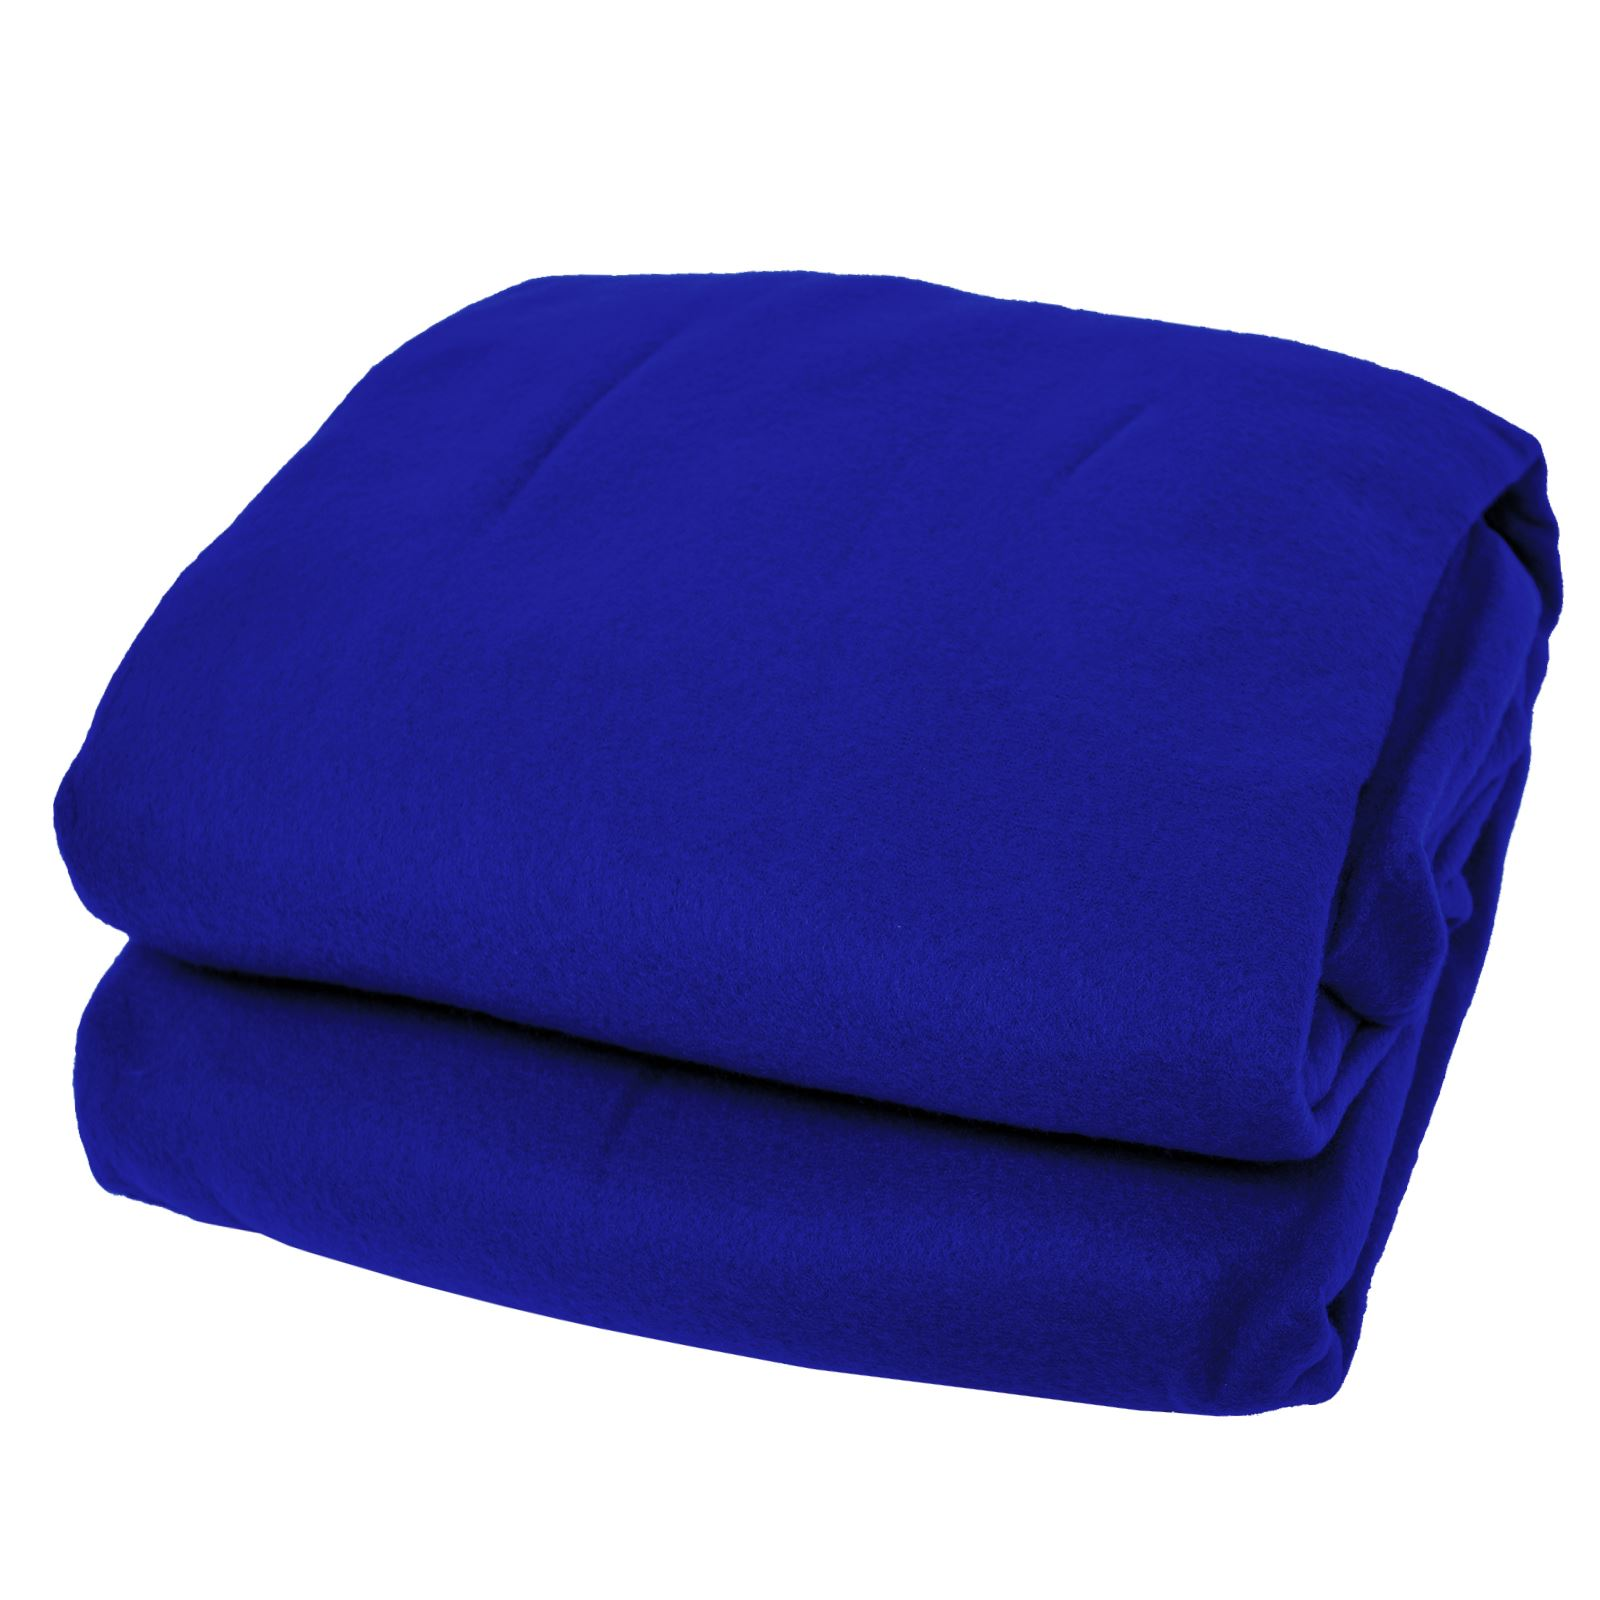 Cuddle Blanket Snuggle Plush Soft Fleece Wrap With Sleeves Winter Cosy Warm Snug